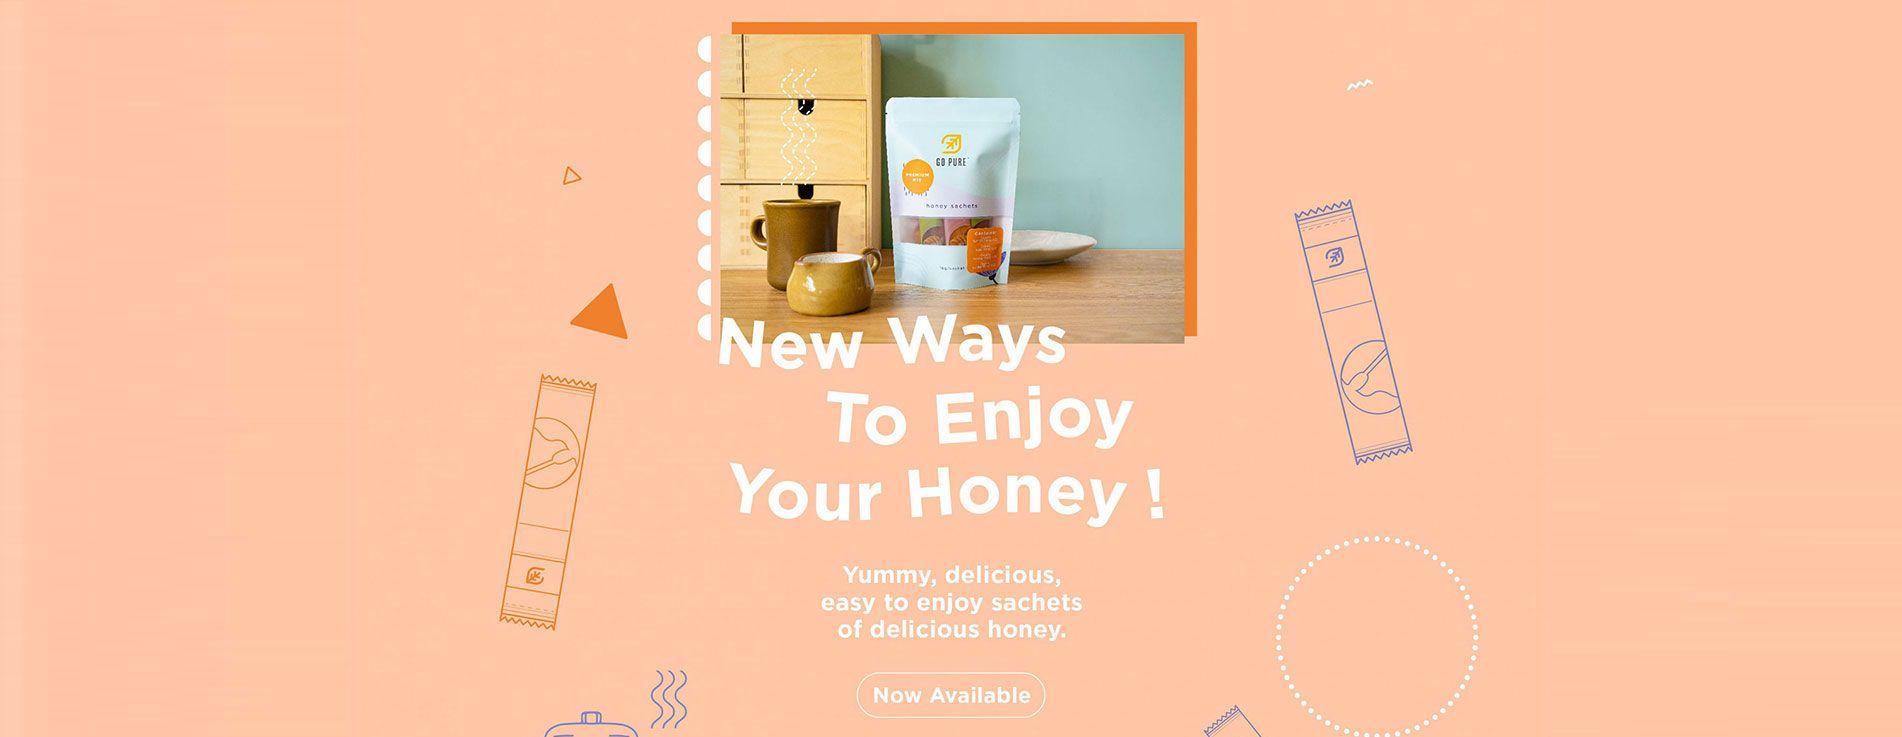 New Ways to Enjoy Your Honey! Yummy, delicious, easy to enjoy sachets of delicious honey. Now Available!